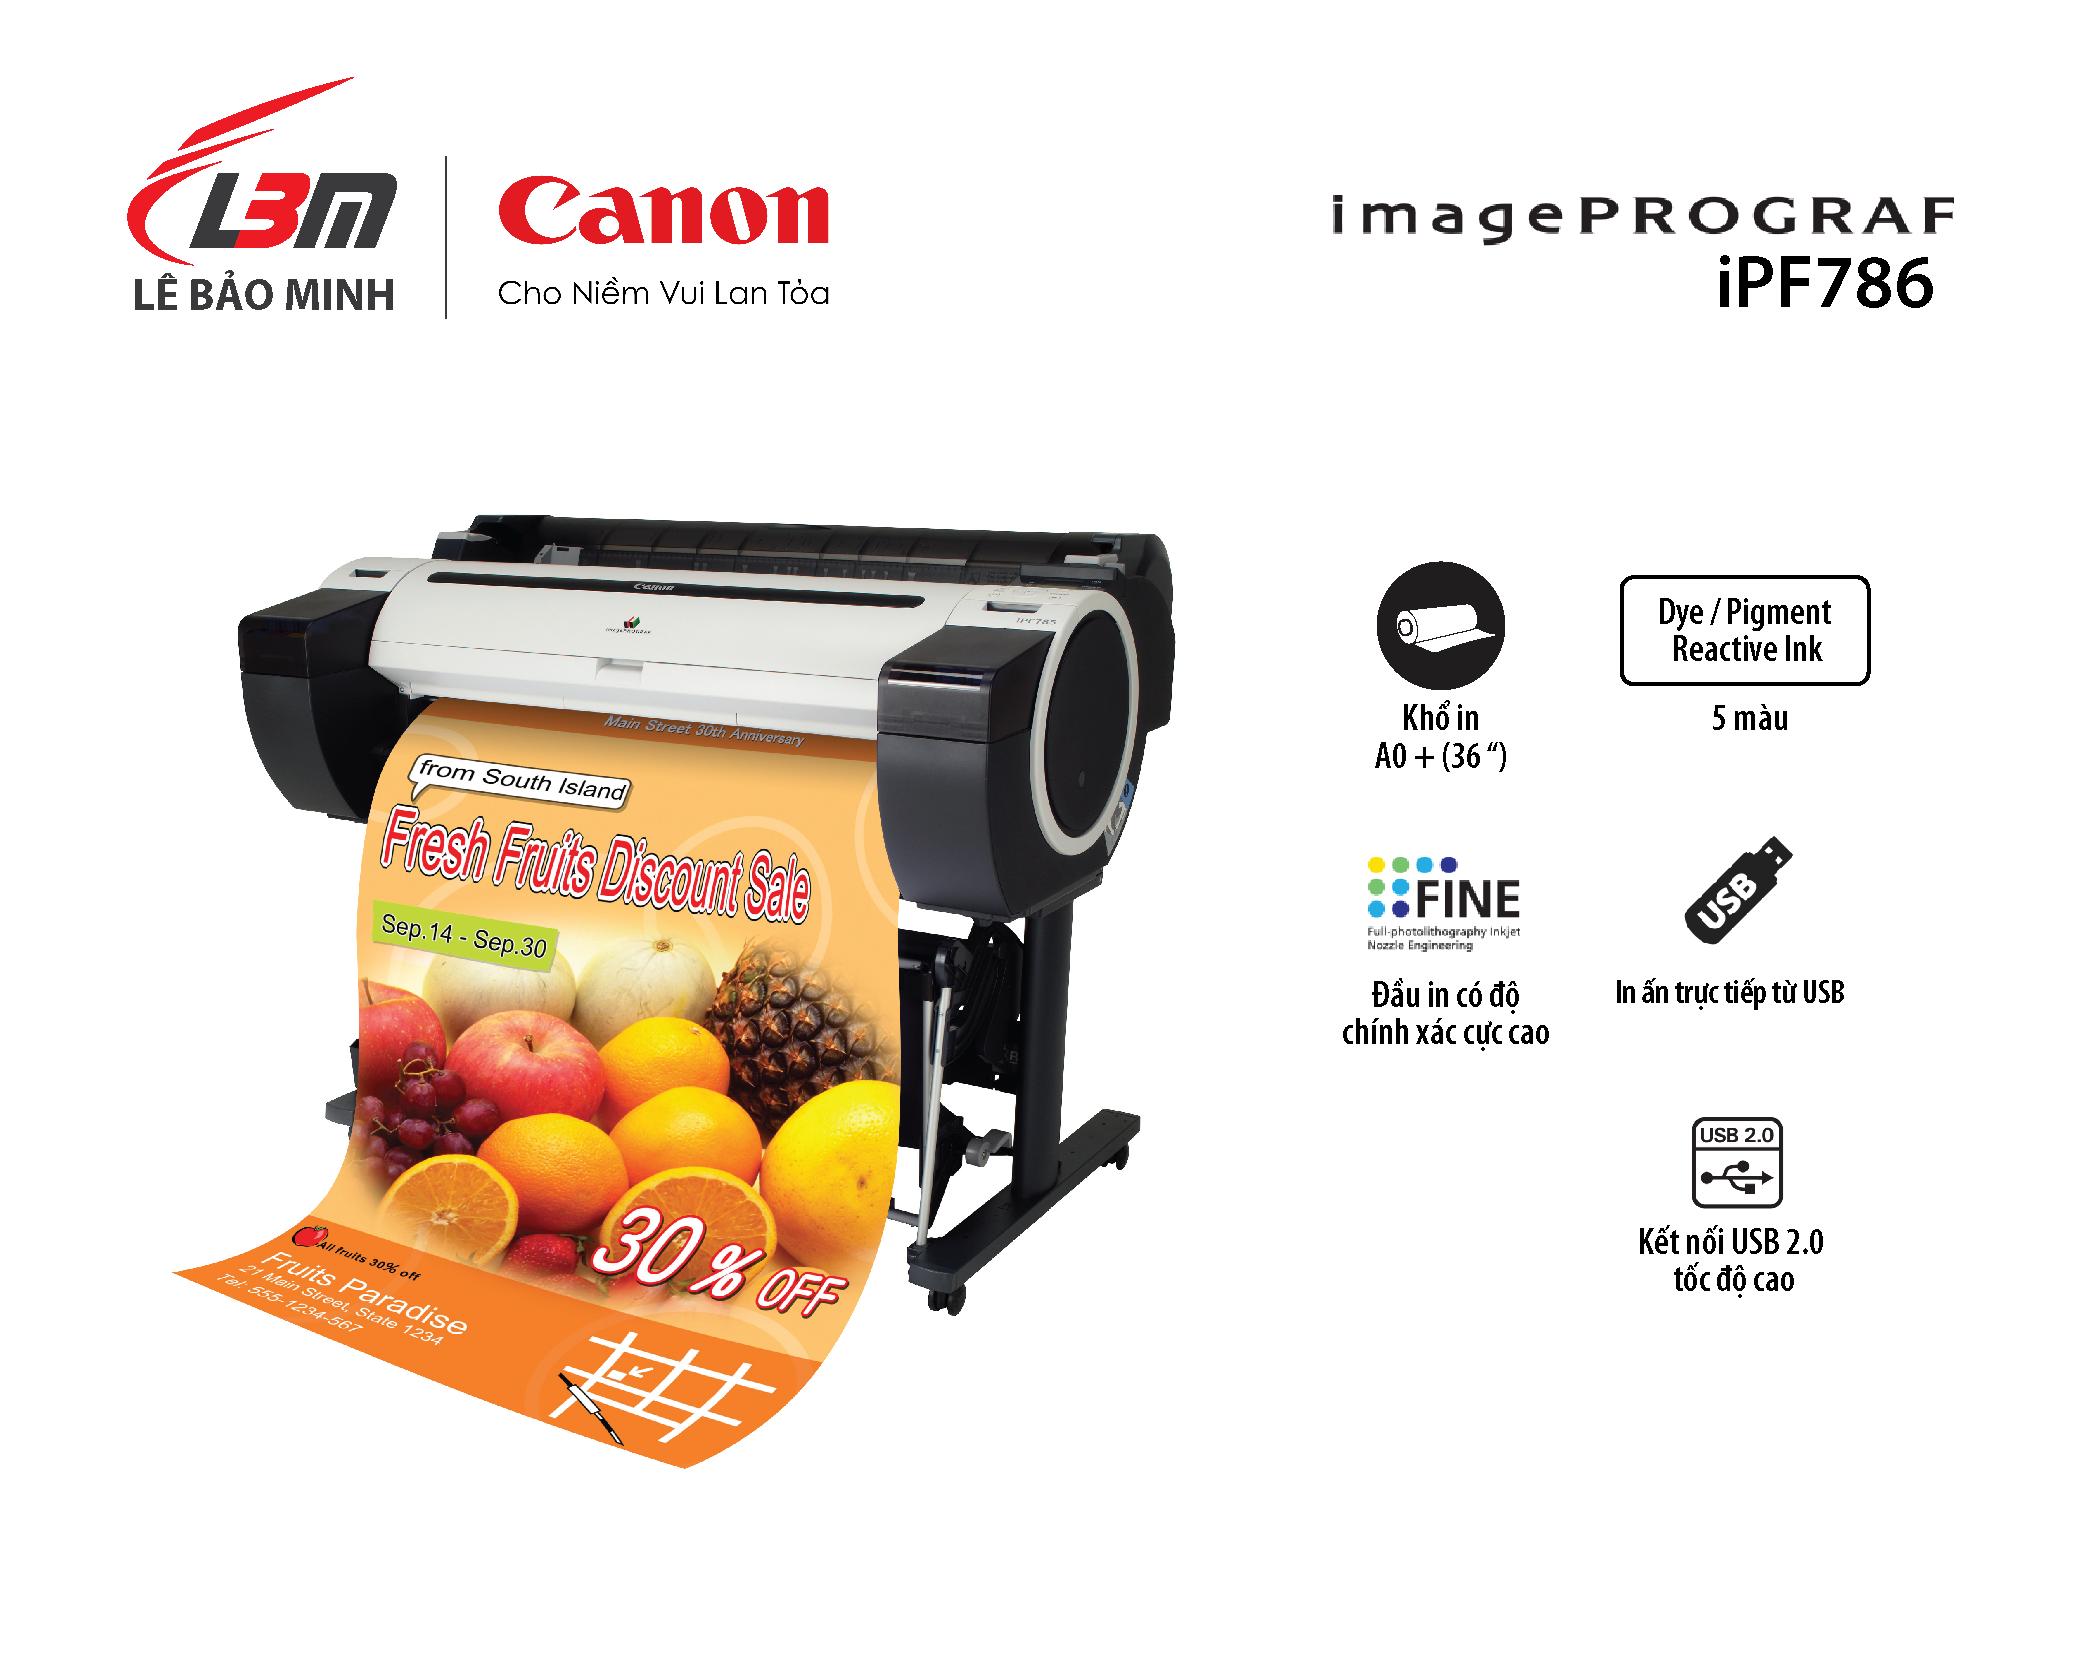 imagePROGRAF iPF786 (5 màu mực)